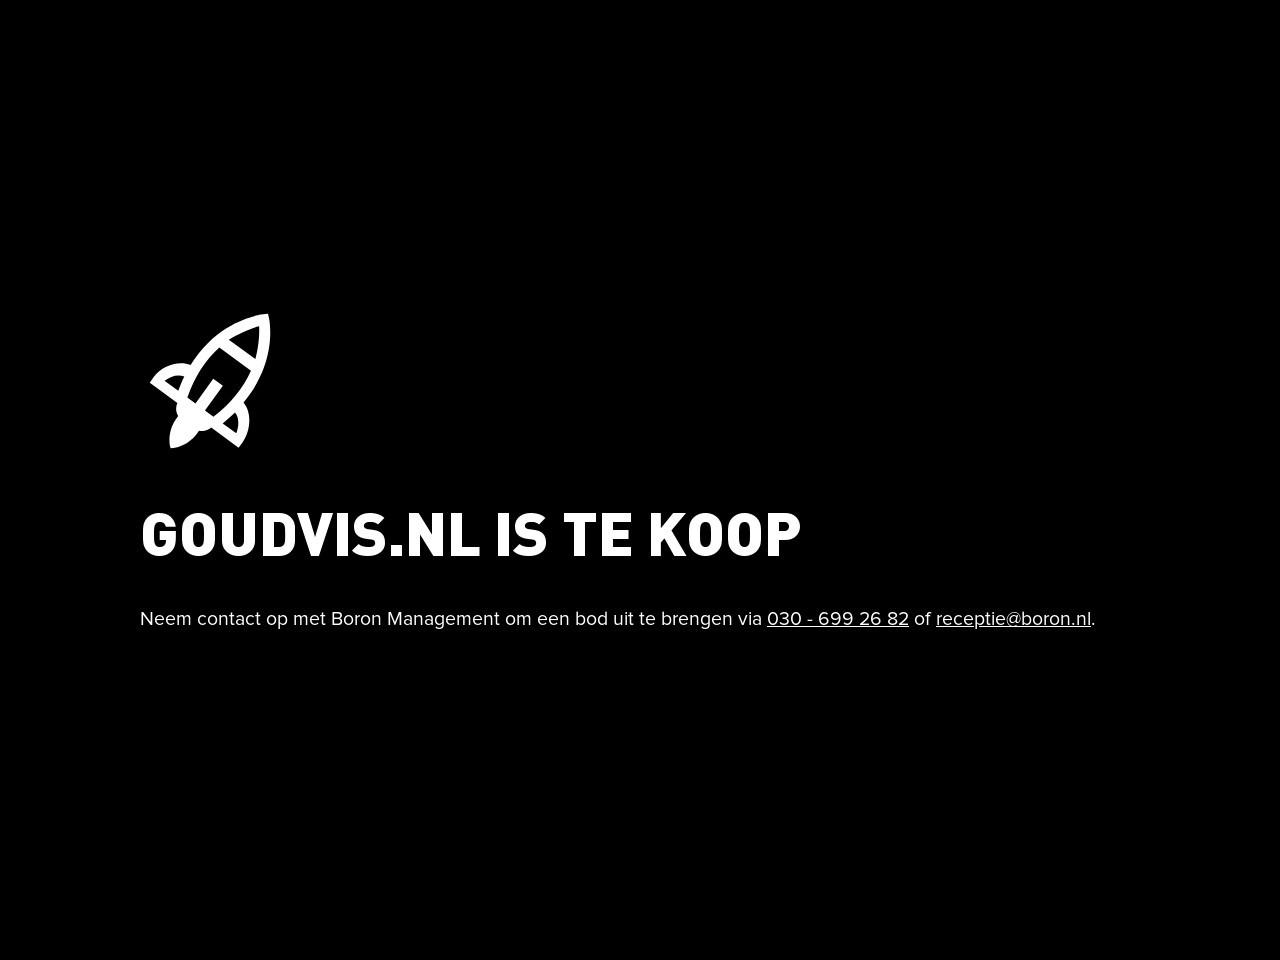 http://goudvis.nl.nerdydata.com